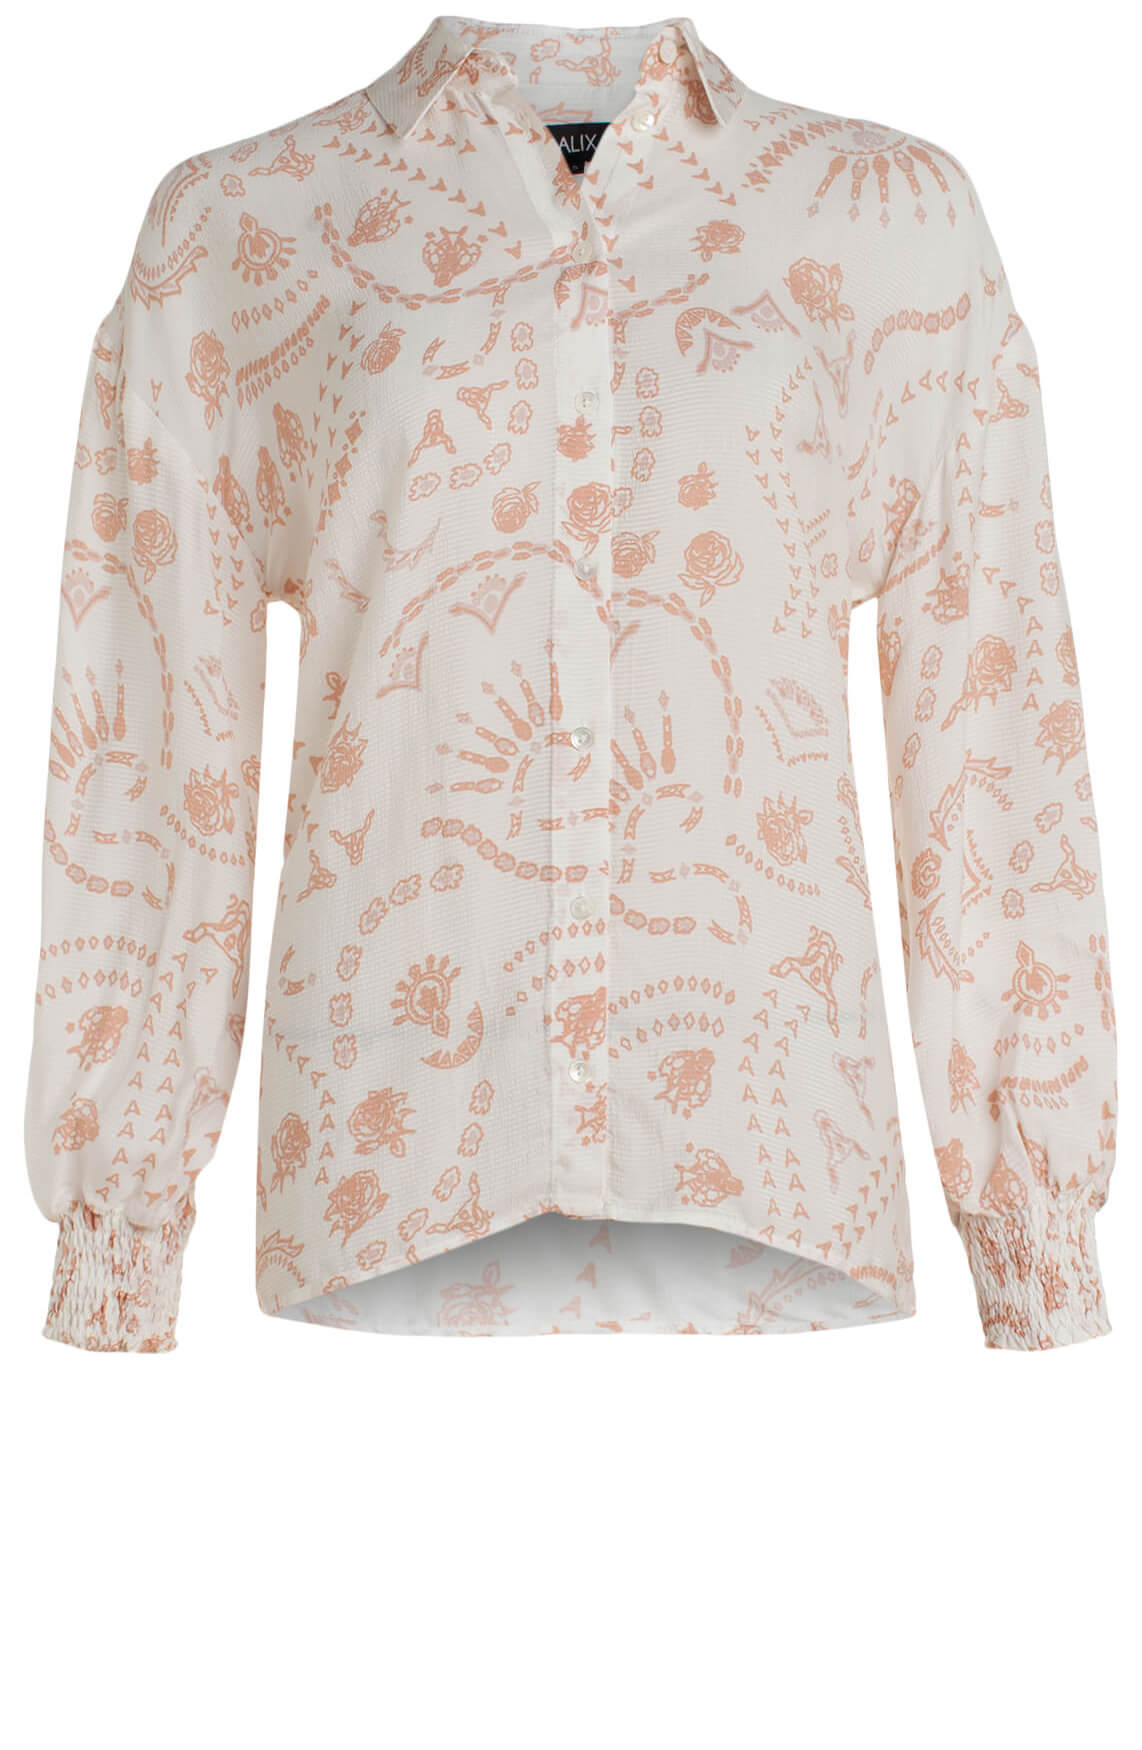 Alix The Label Dames Blouse met print wit